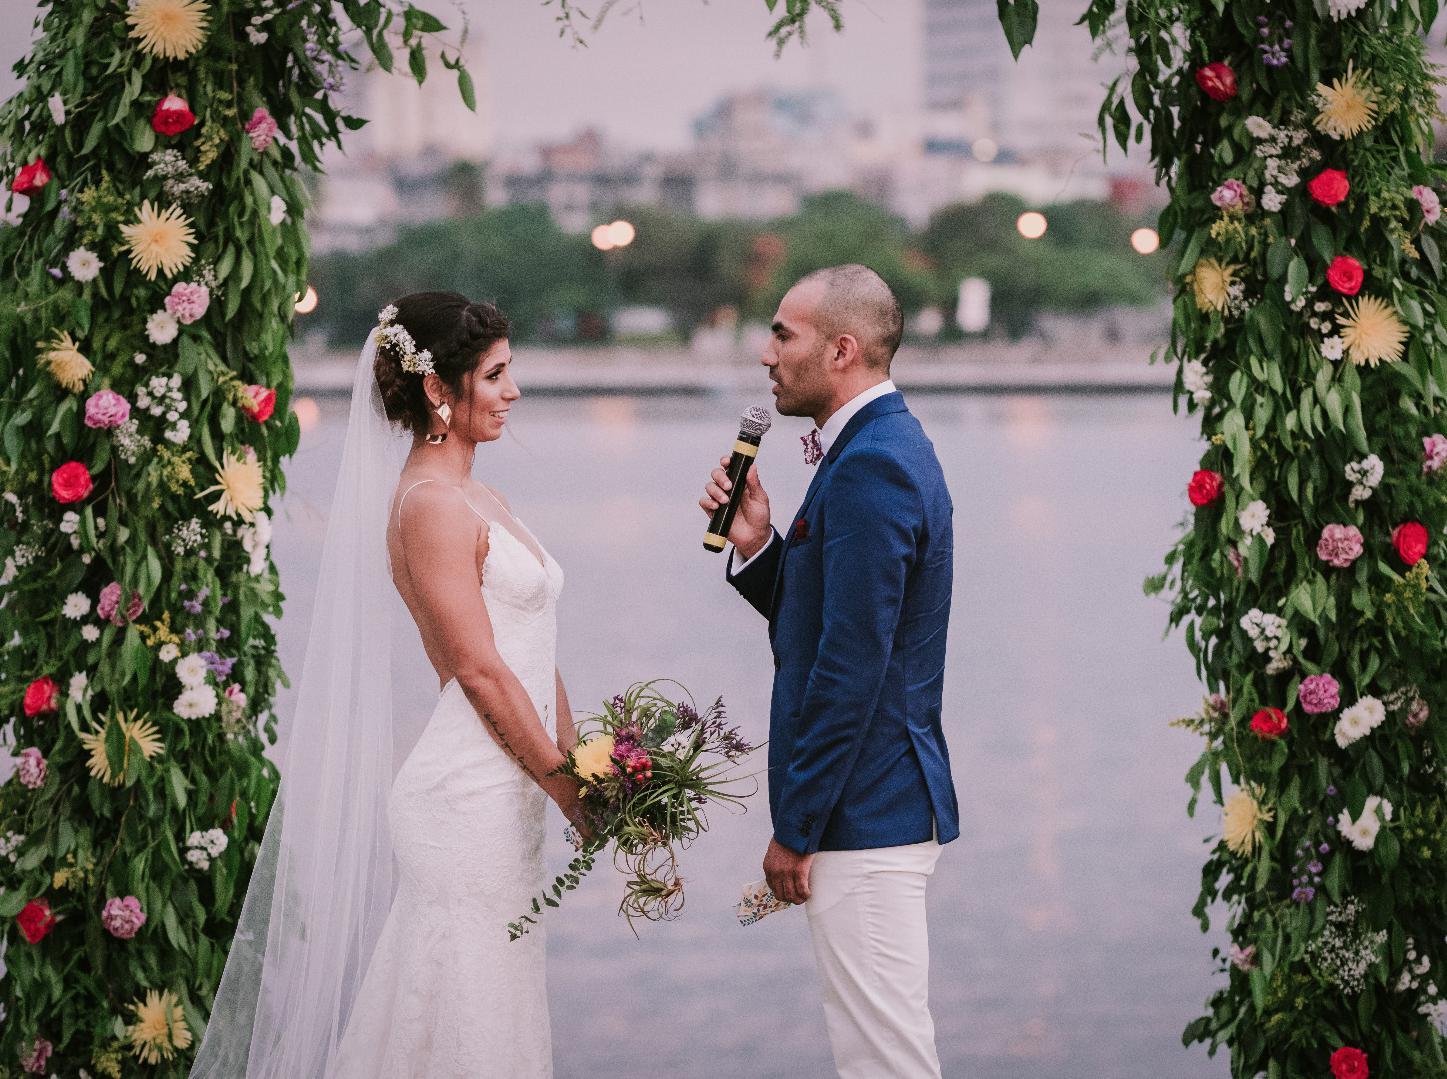 bodas-sin-clasificar-sin-tema-cuba-29321.jpg